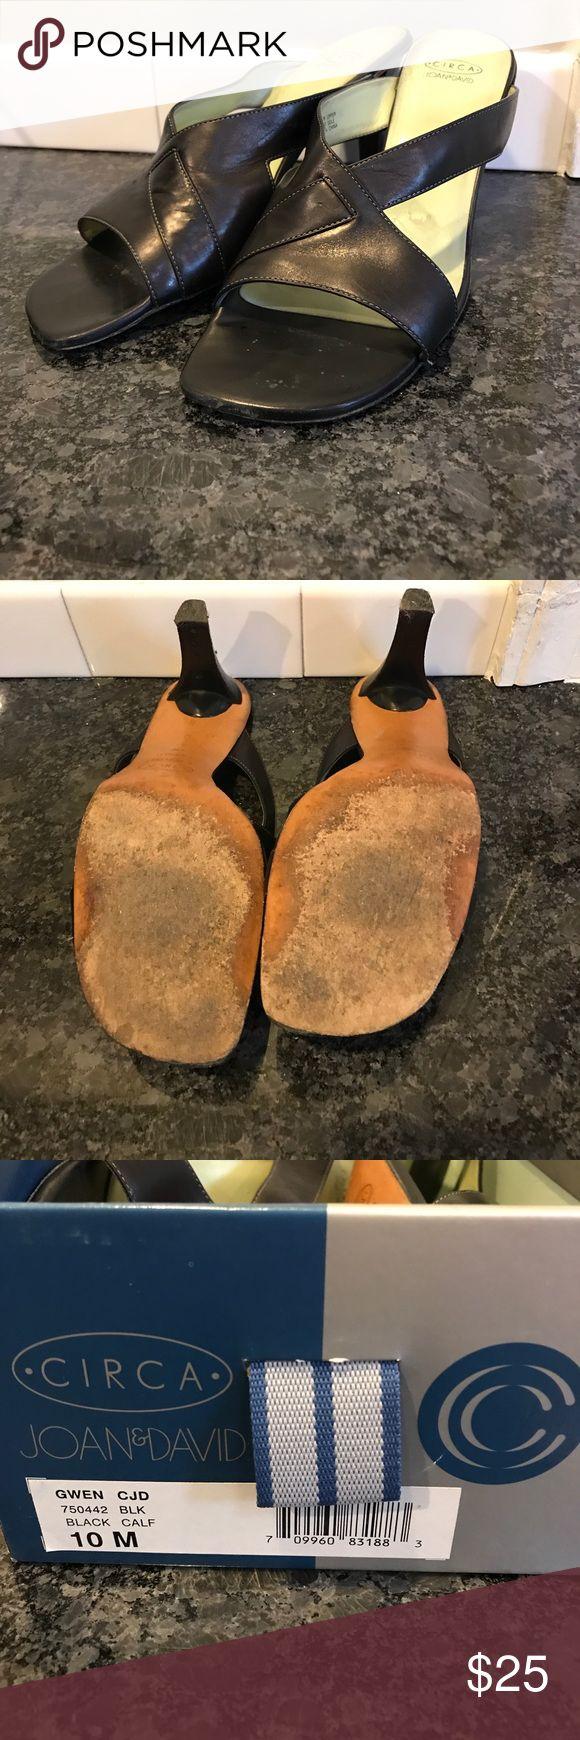 "Joan and David ""Gwen"" Sandal Black heeled sandal, perfect for summertime events! Joan & David Shoes Sandals"